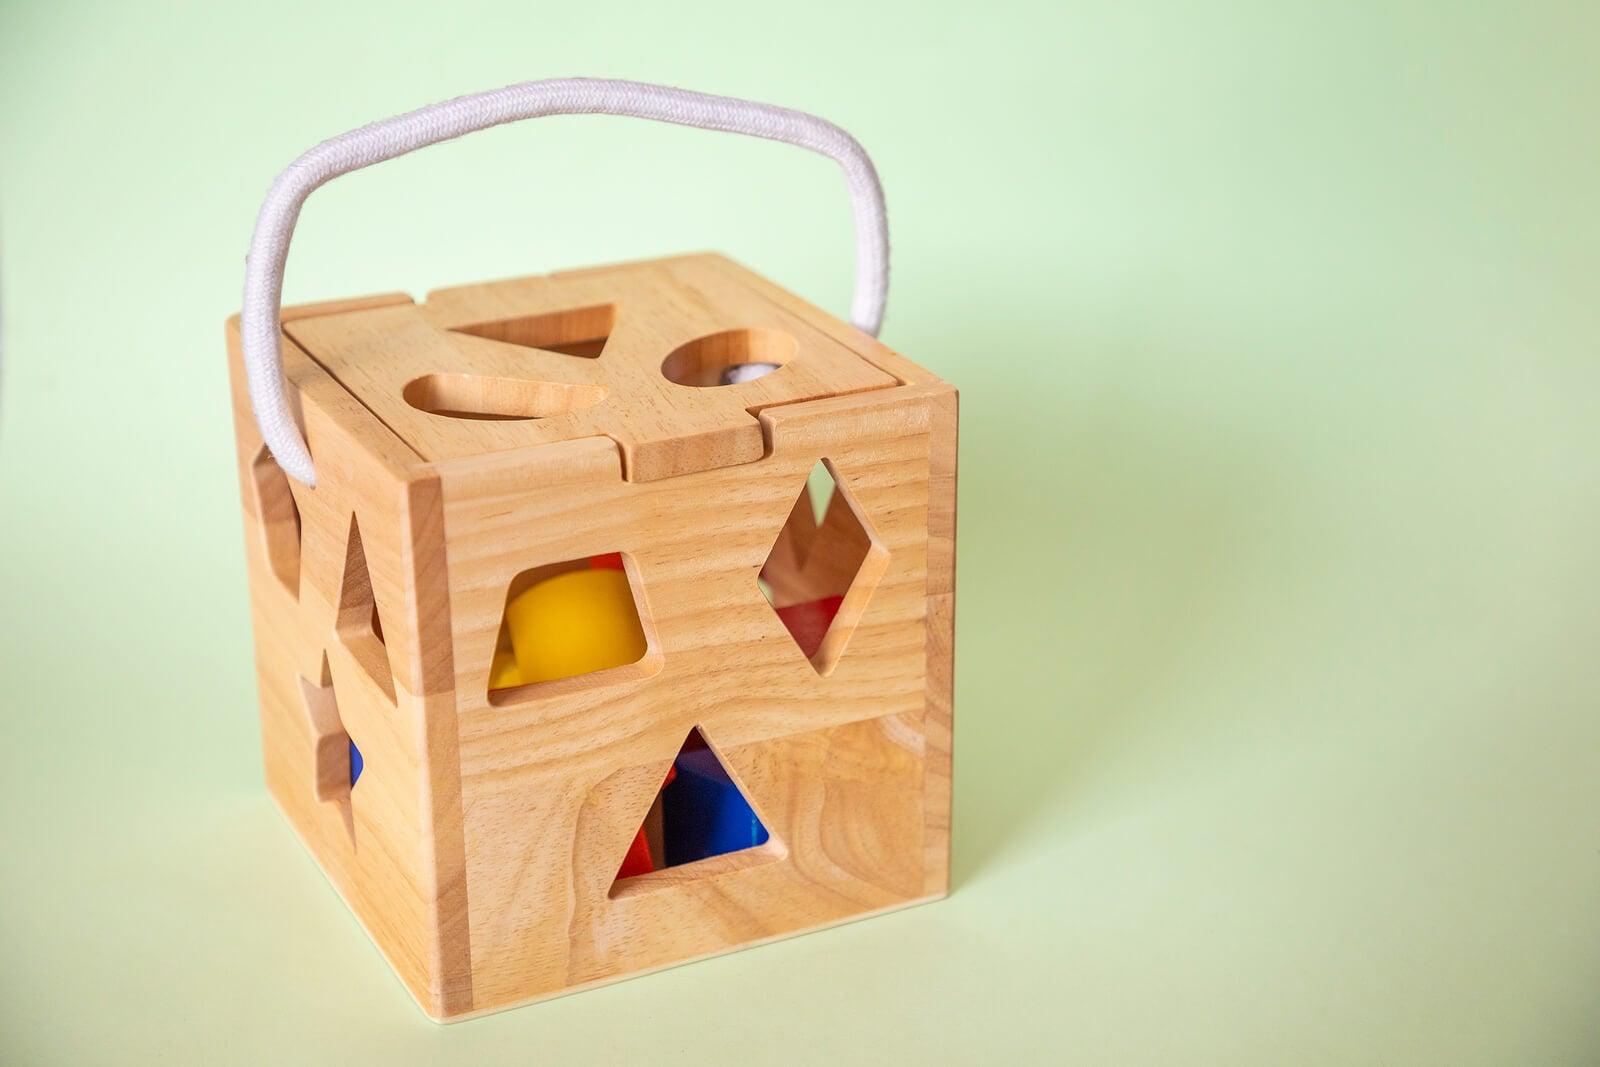 Cubo de madera ecológico.